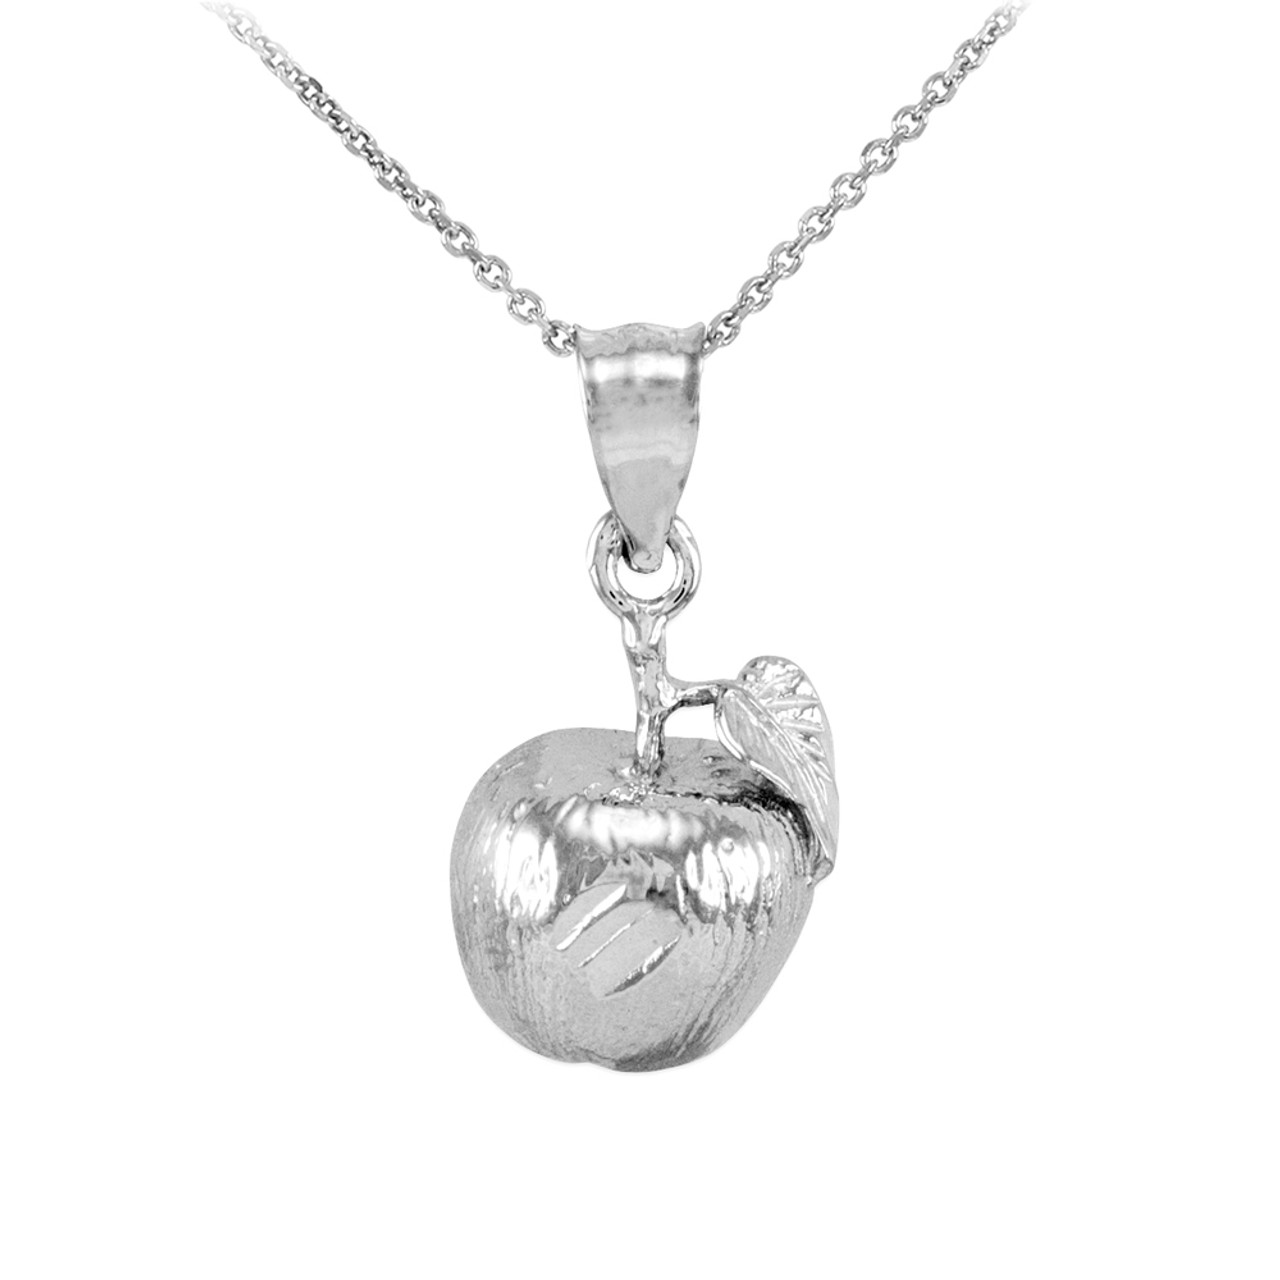 White gold apple charm pendant necklace aloadofball Gallery